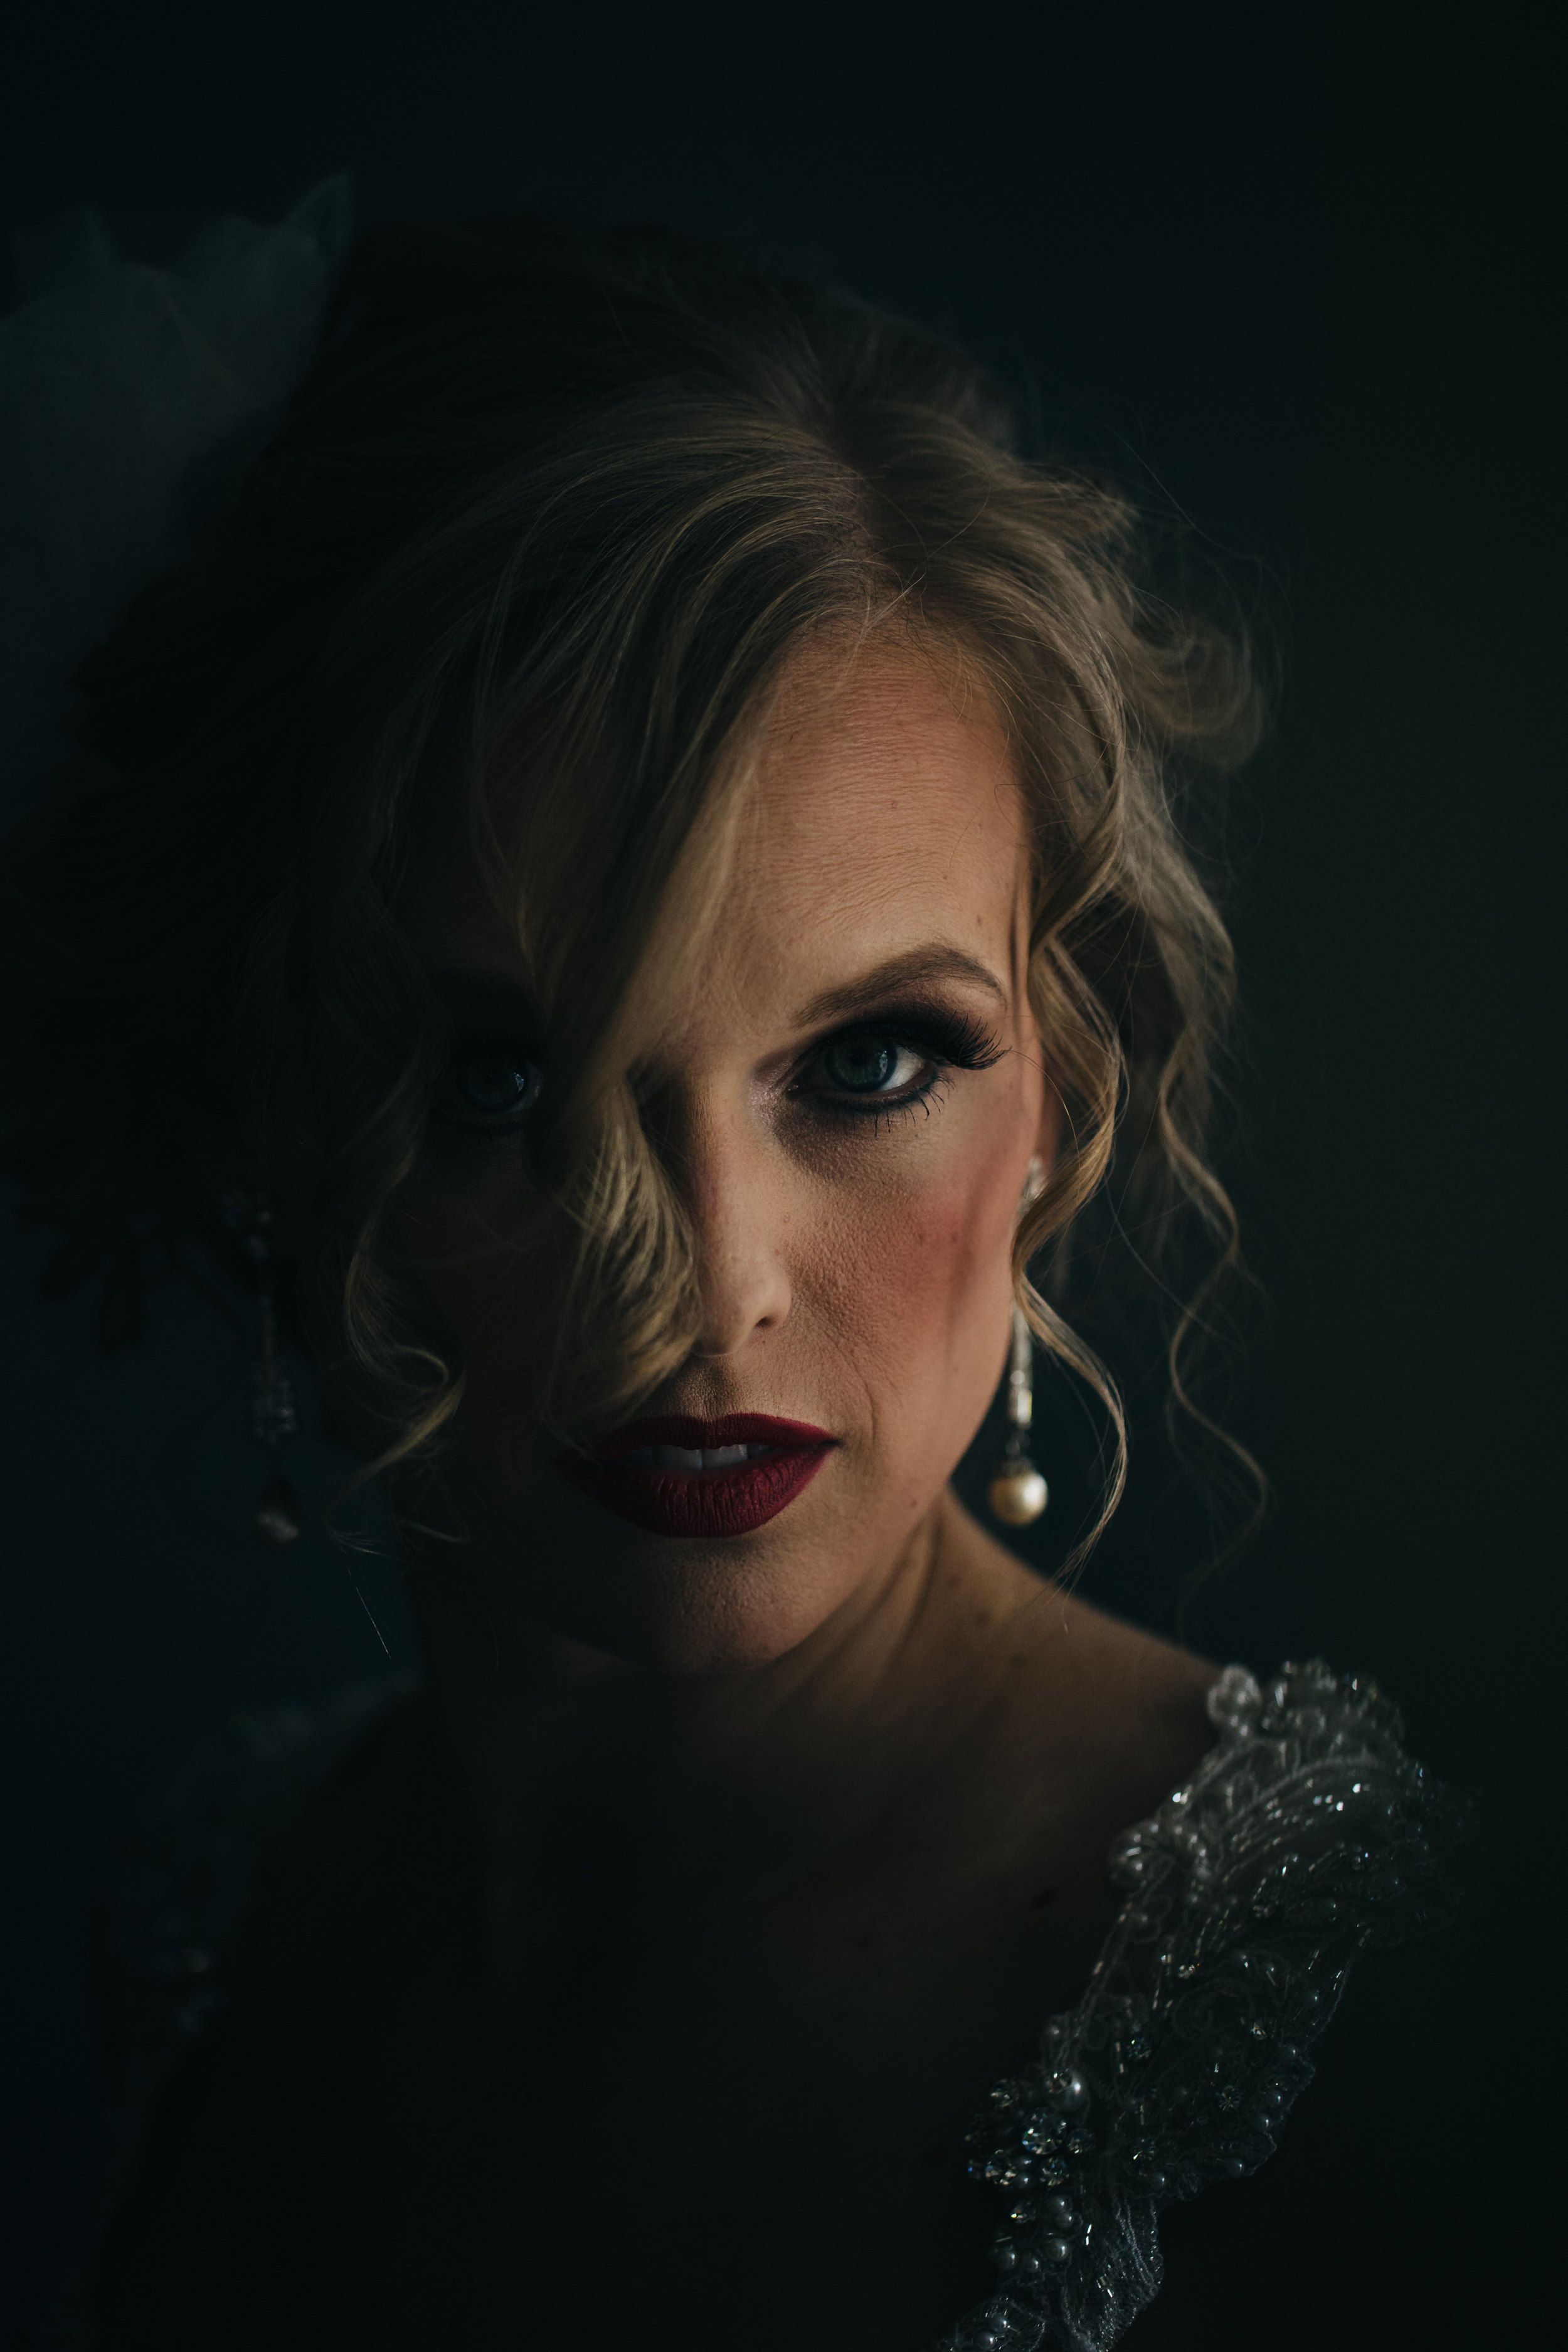 Stunning wedding makeup by Ashley Rockwell Makeup.